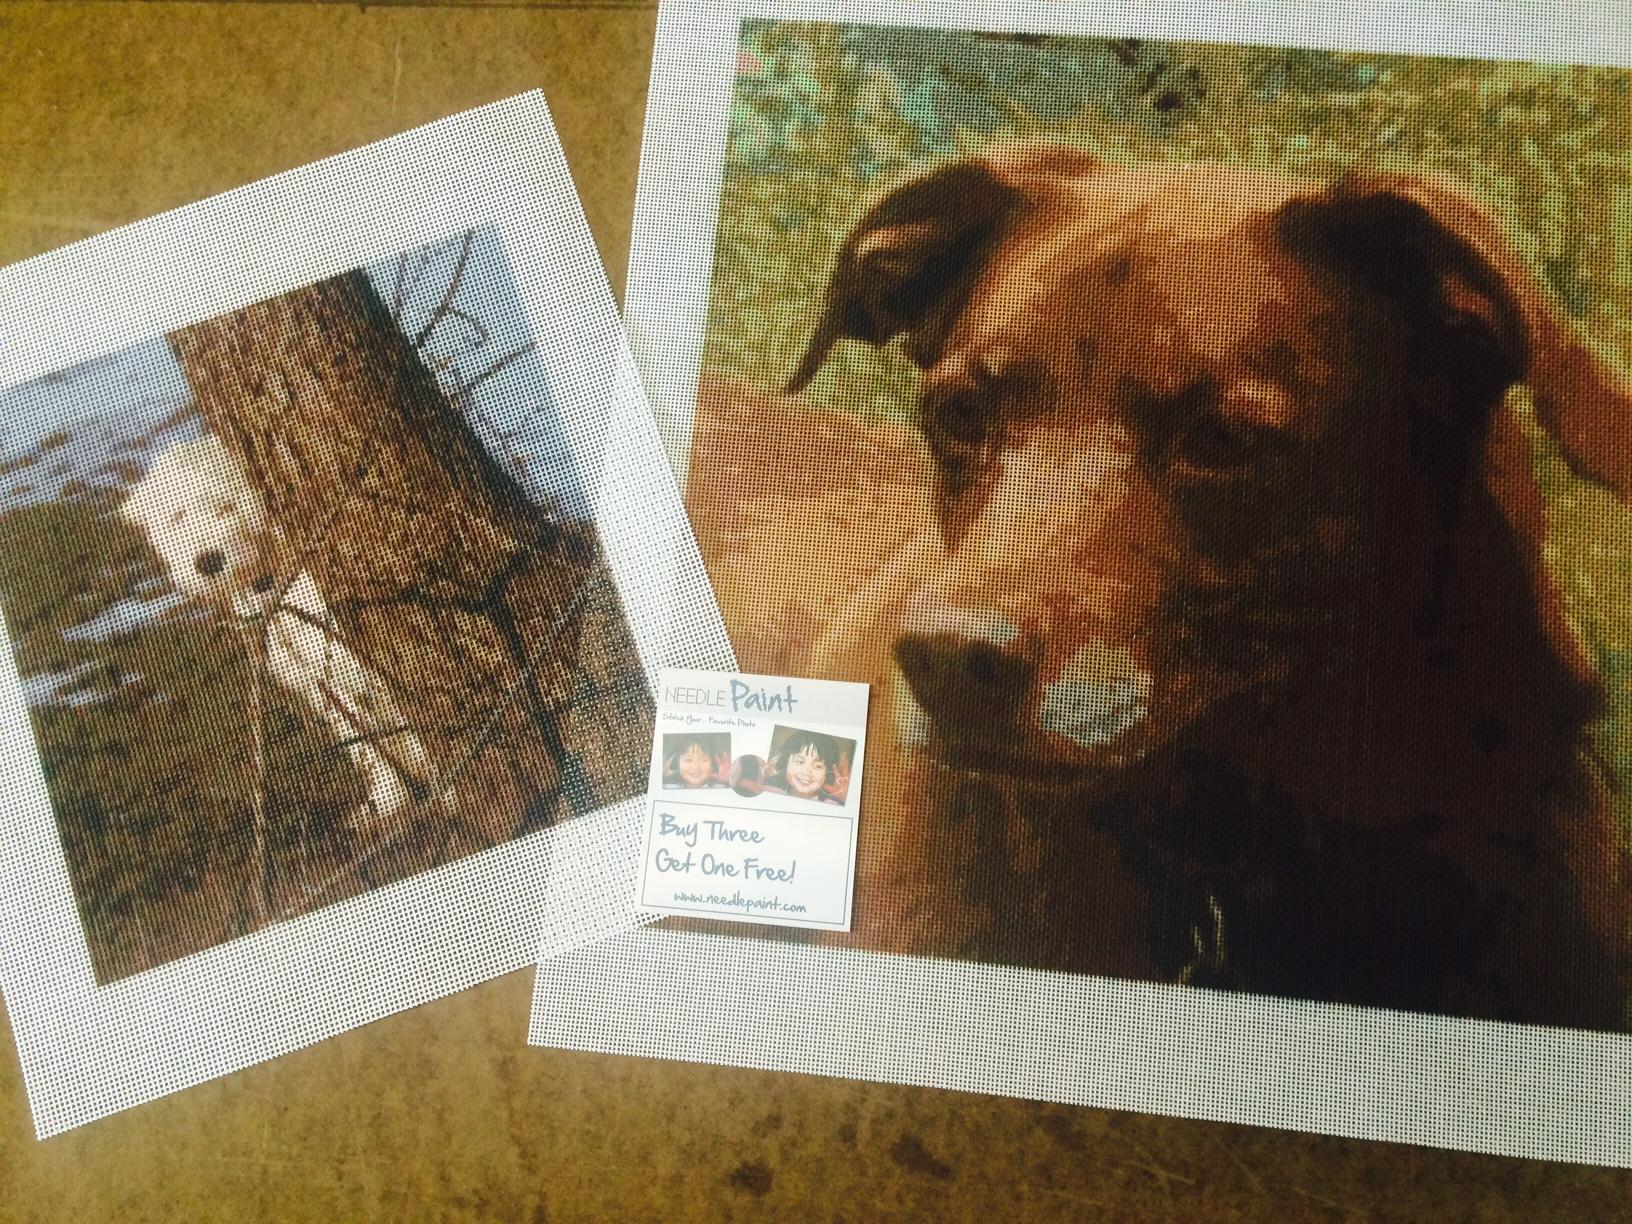 Cute Dog Needlepoint Kits from Photos